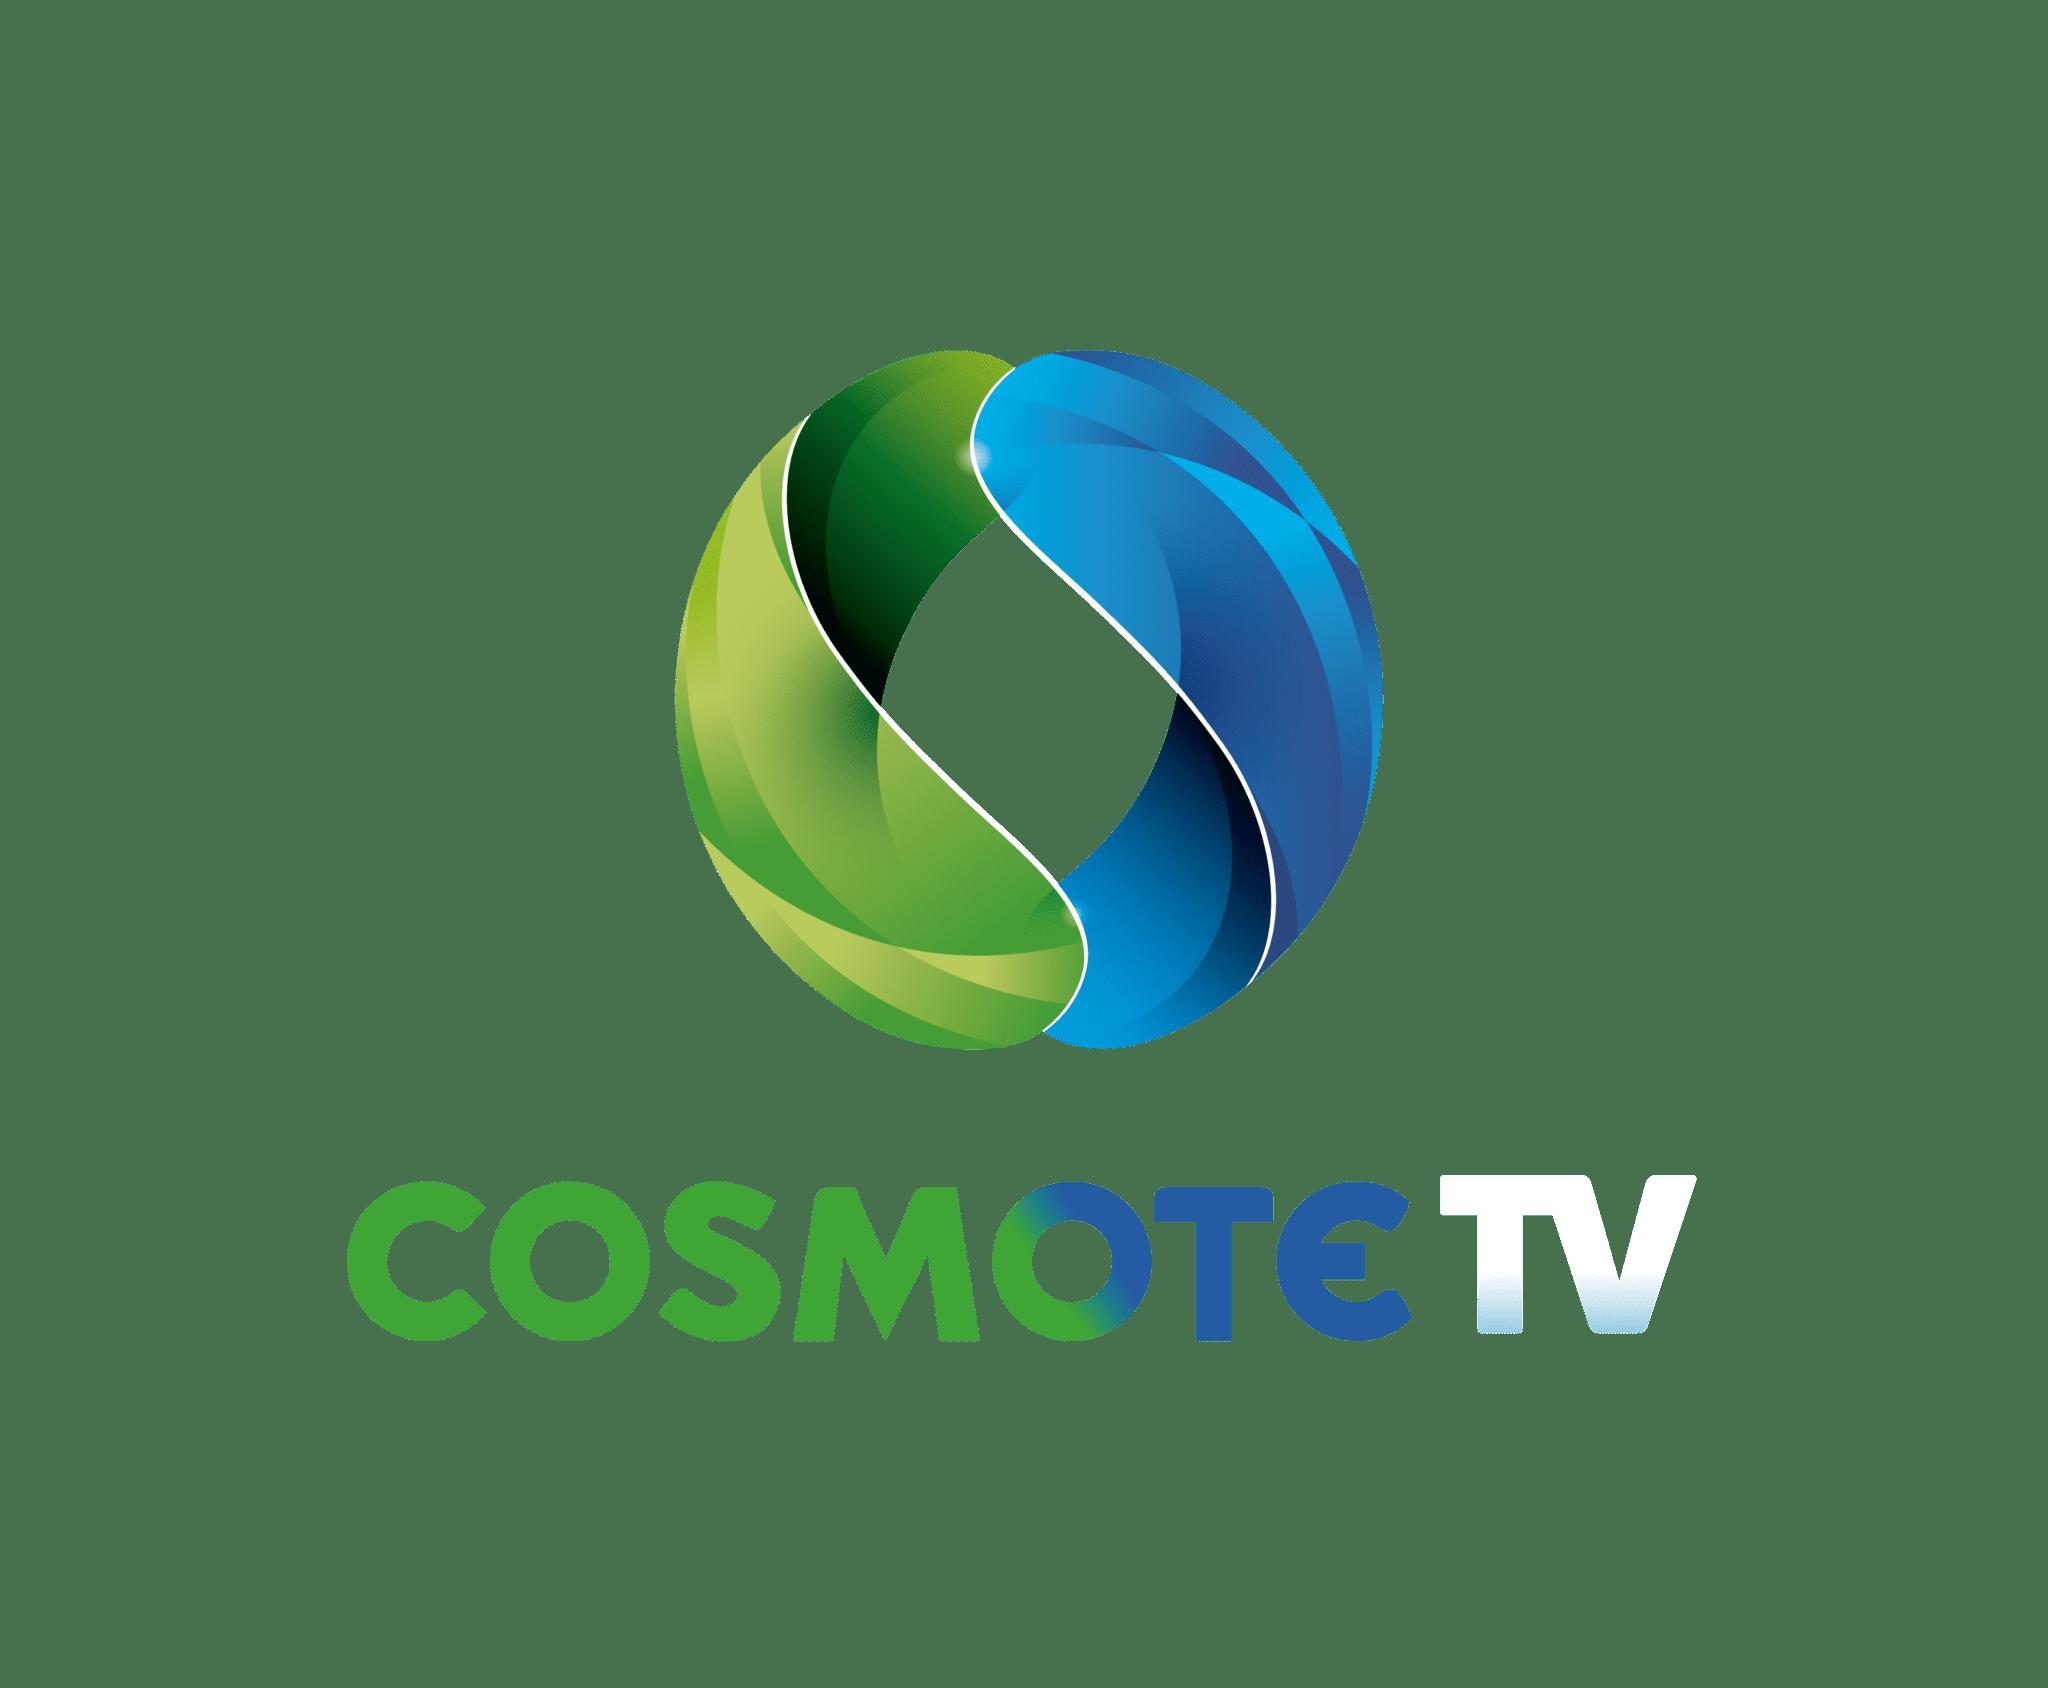 COSMOTE TV LOGO